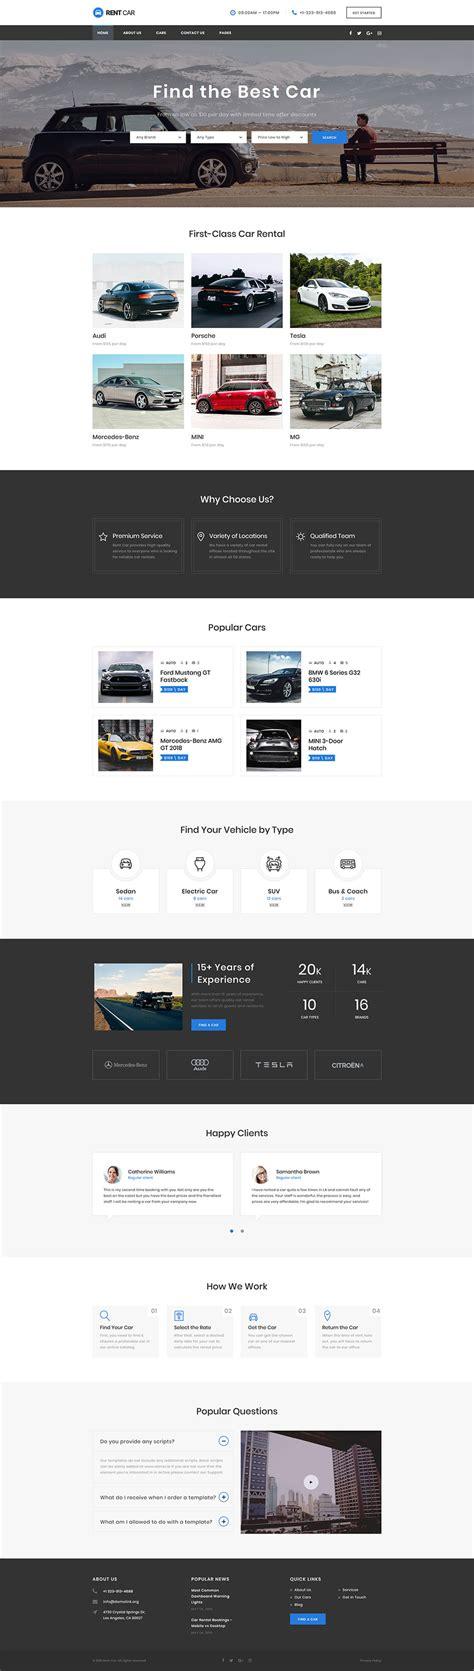 Car Rental Responsive Website Template 48656 Rental Website Templates